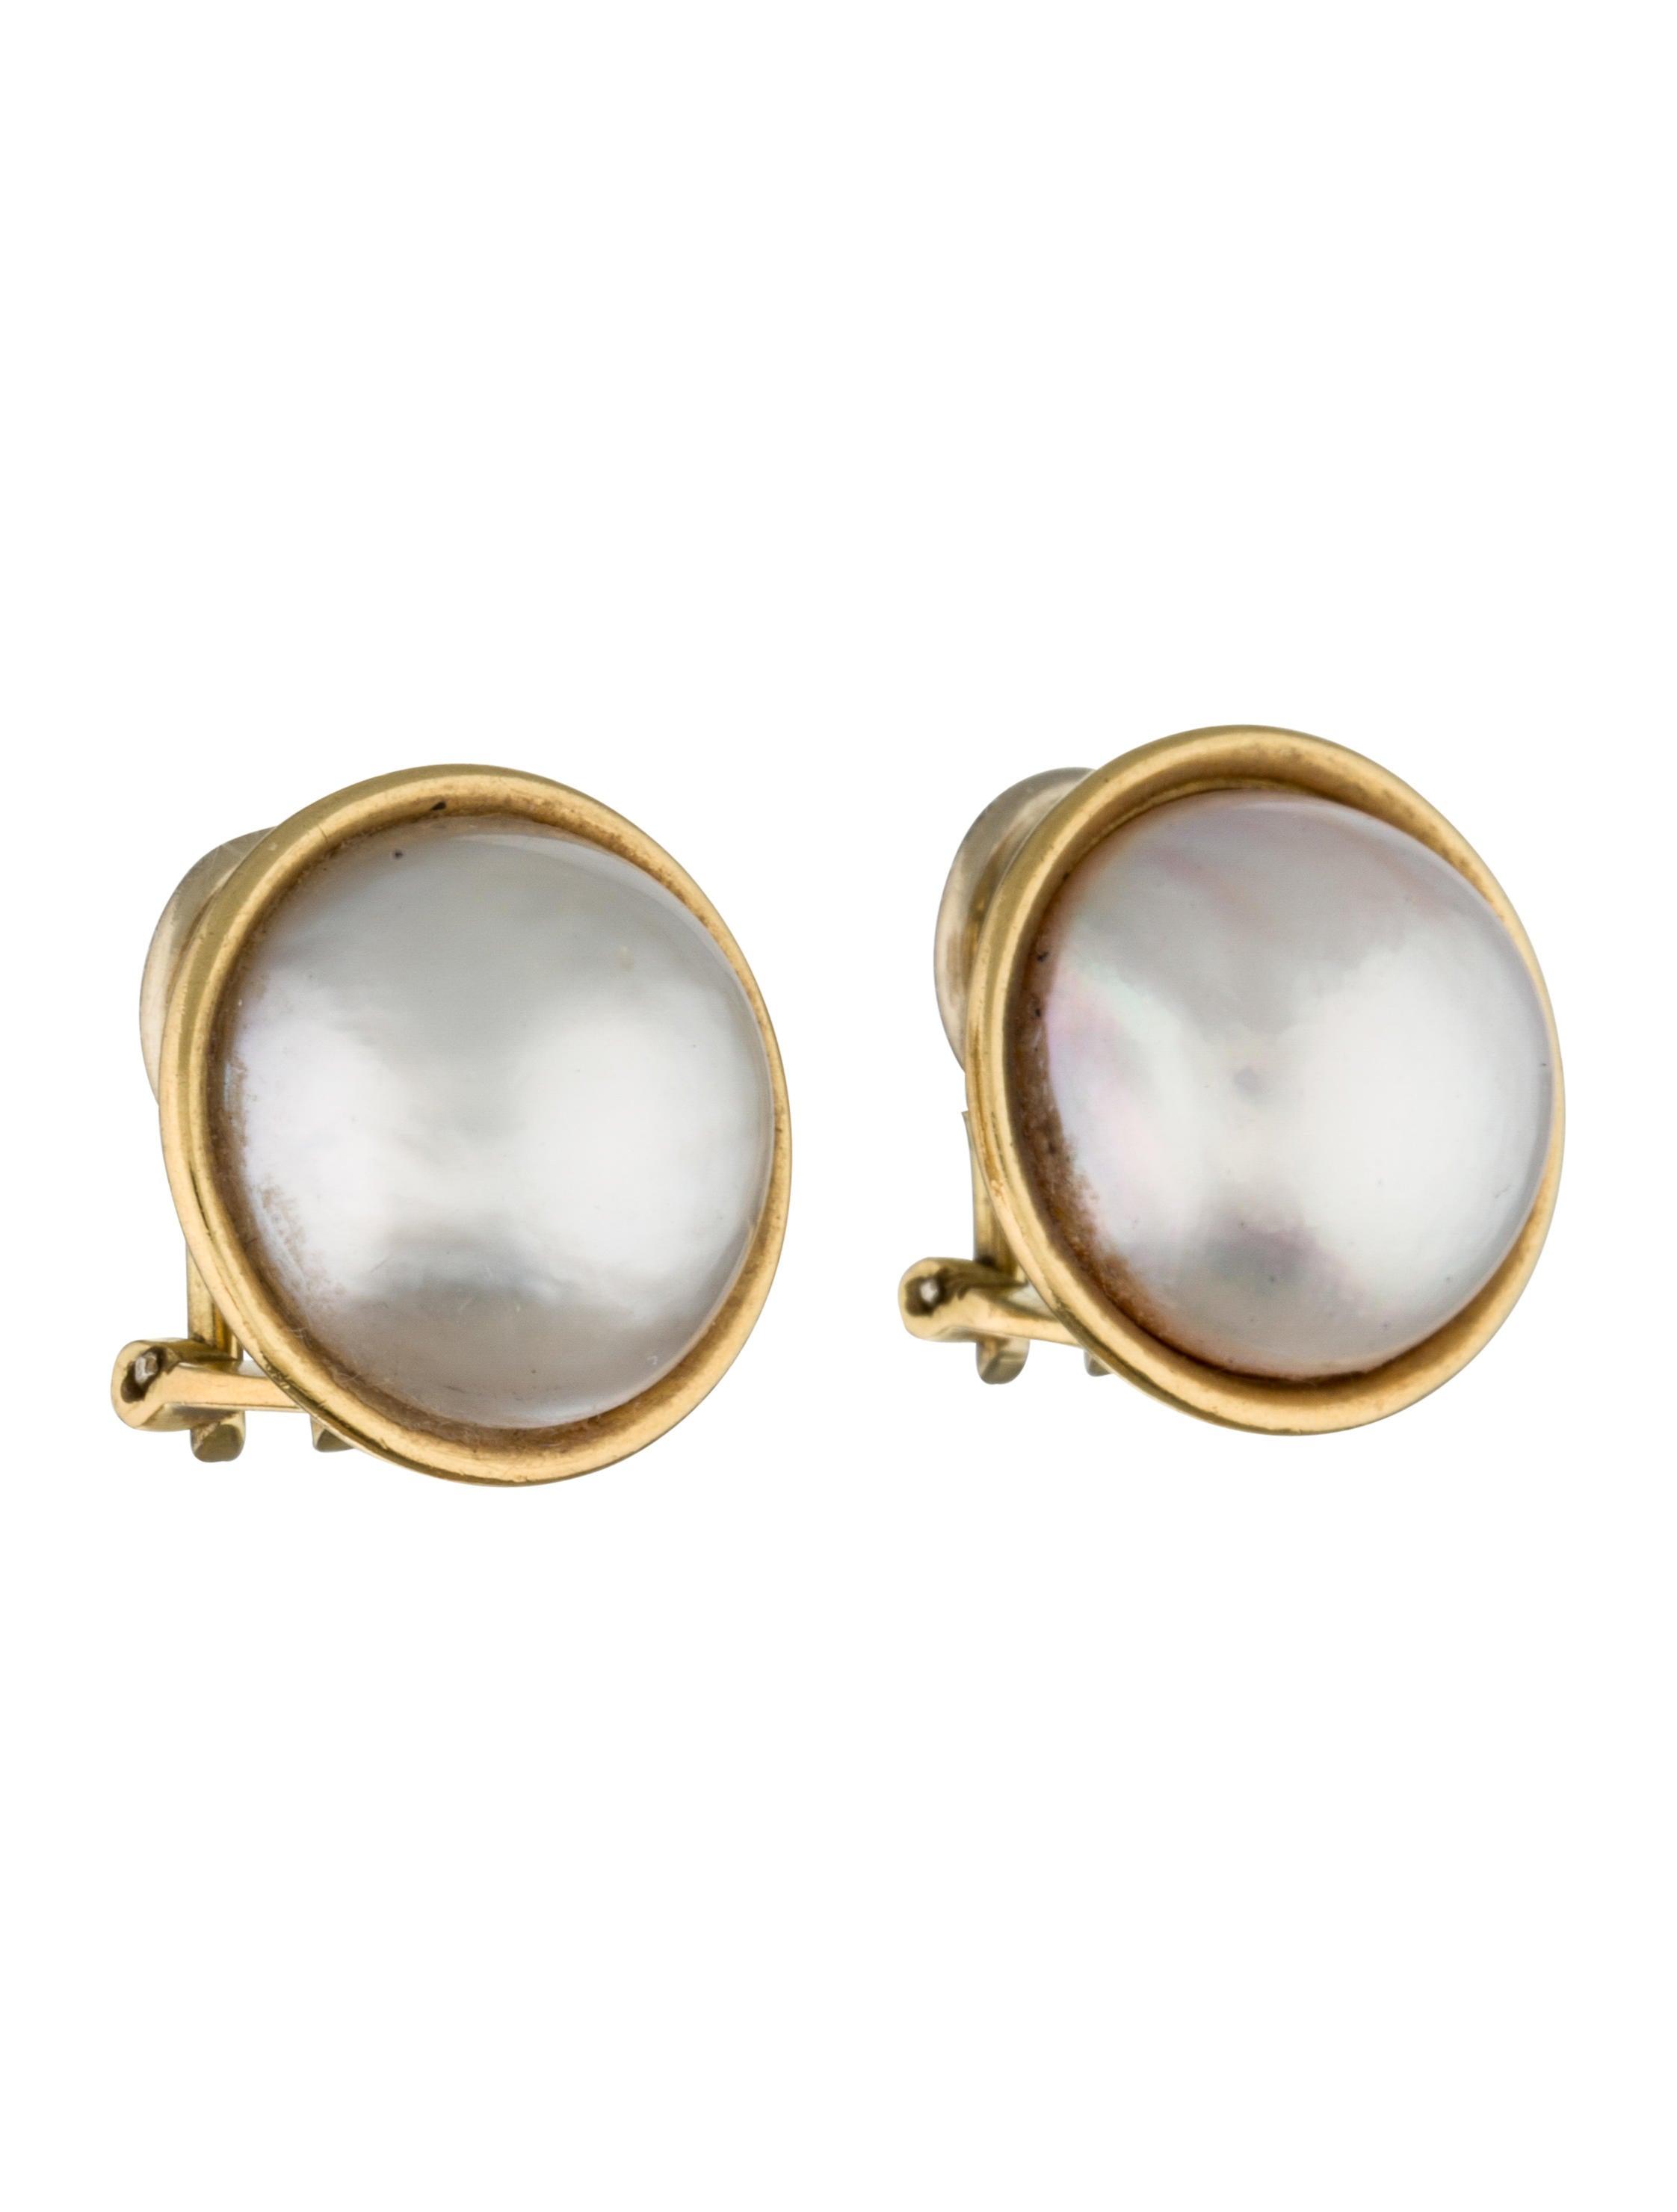 18k mabe pearl clip on earrings earrings fje28501. Black Bedroom Furniture Sets. Home Design Ideas